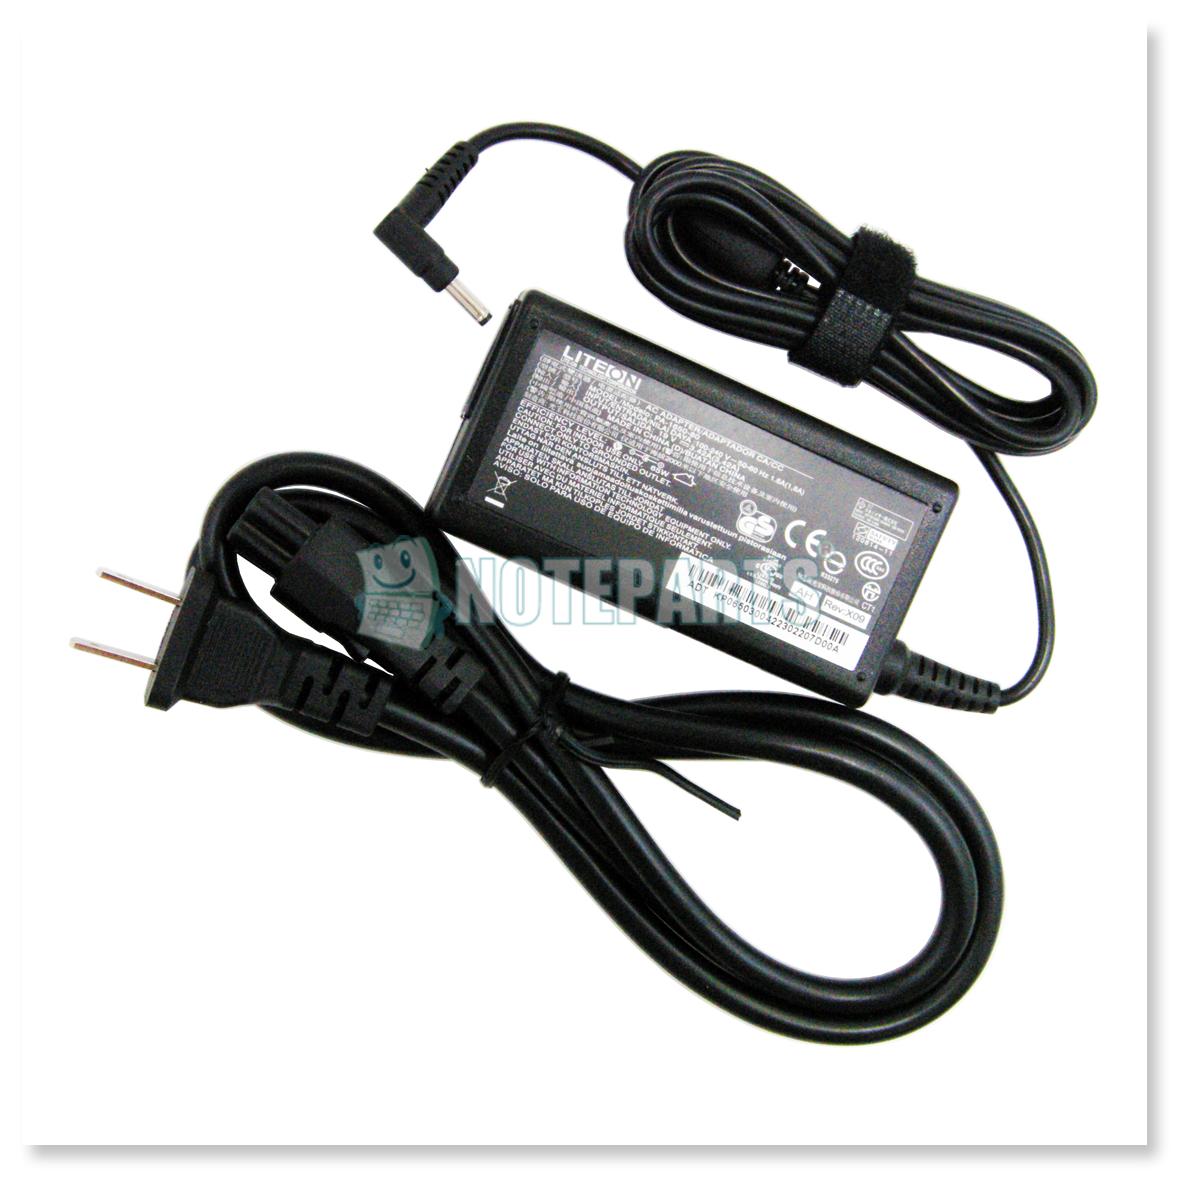 Acer エイサー Aspire P3 ICONIA W700 19V 3.42A 65W ACアダプター